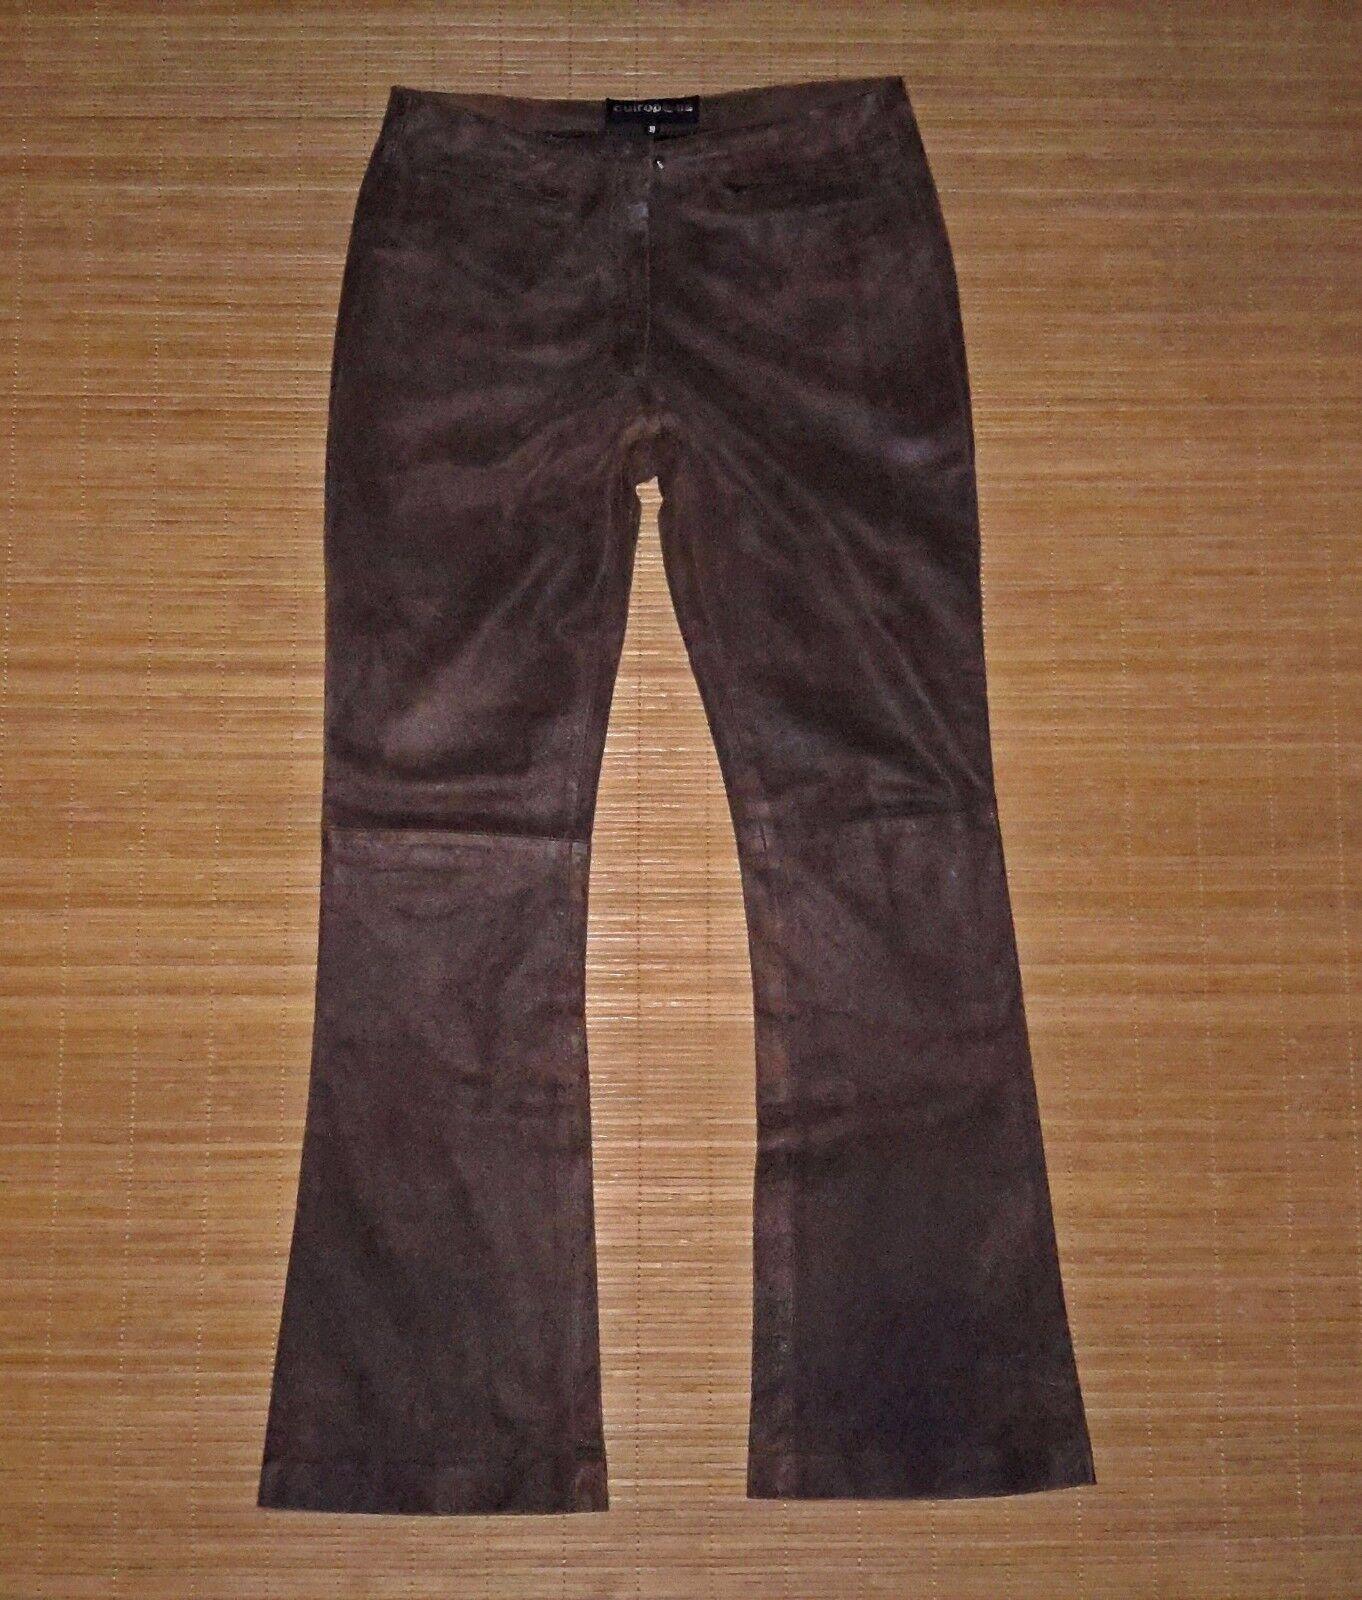 Pantalon CUIROPOLIS en cuir braun vieilli  Größe basse  Größe 40 fr TBE